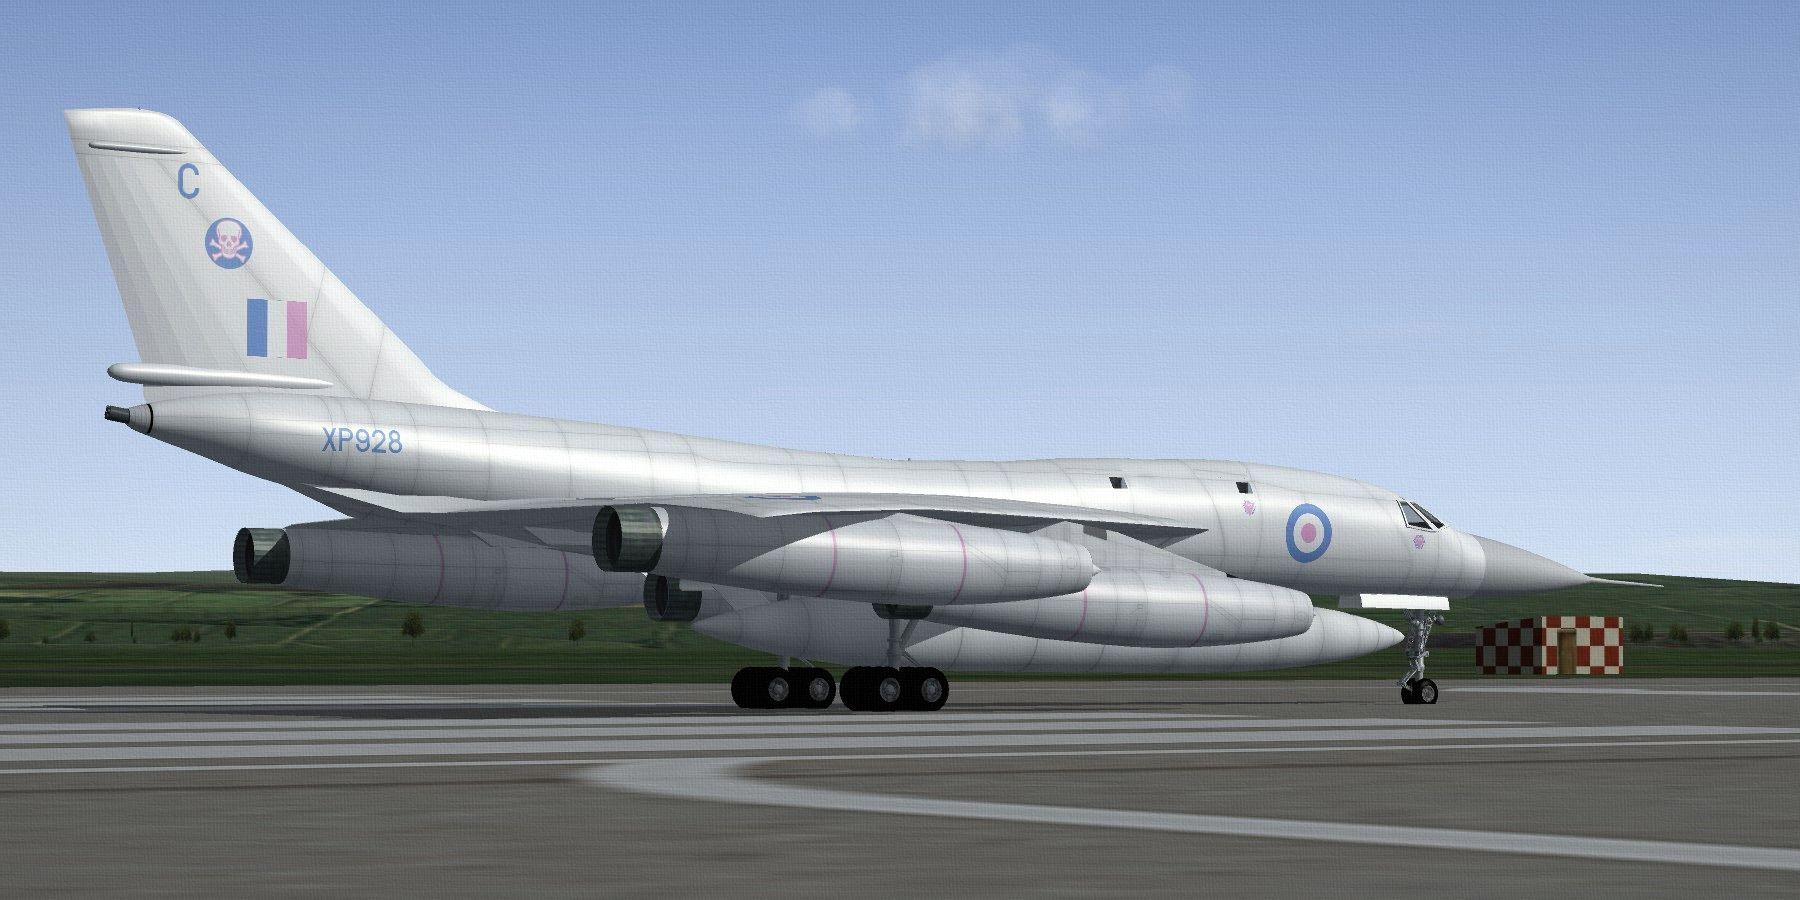 RAF%20HUSTLER%20B1.01_zpsliyipcnh.jpg